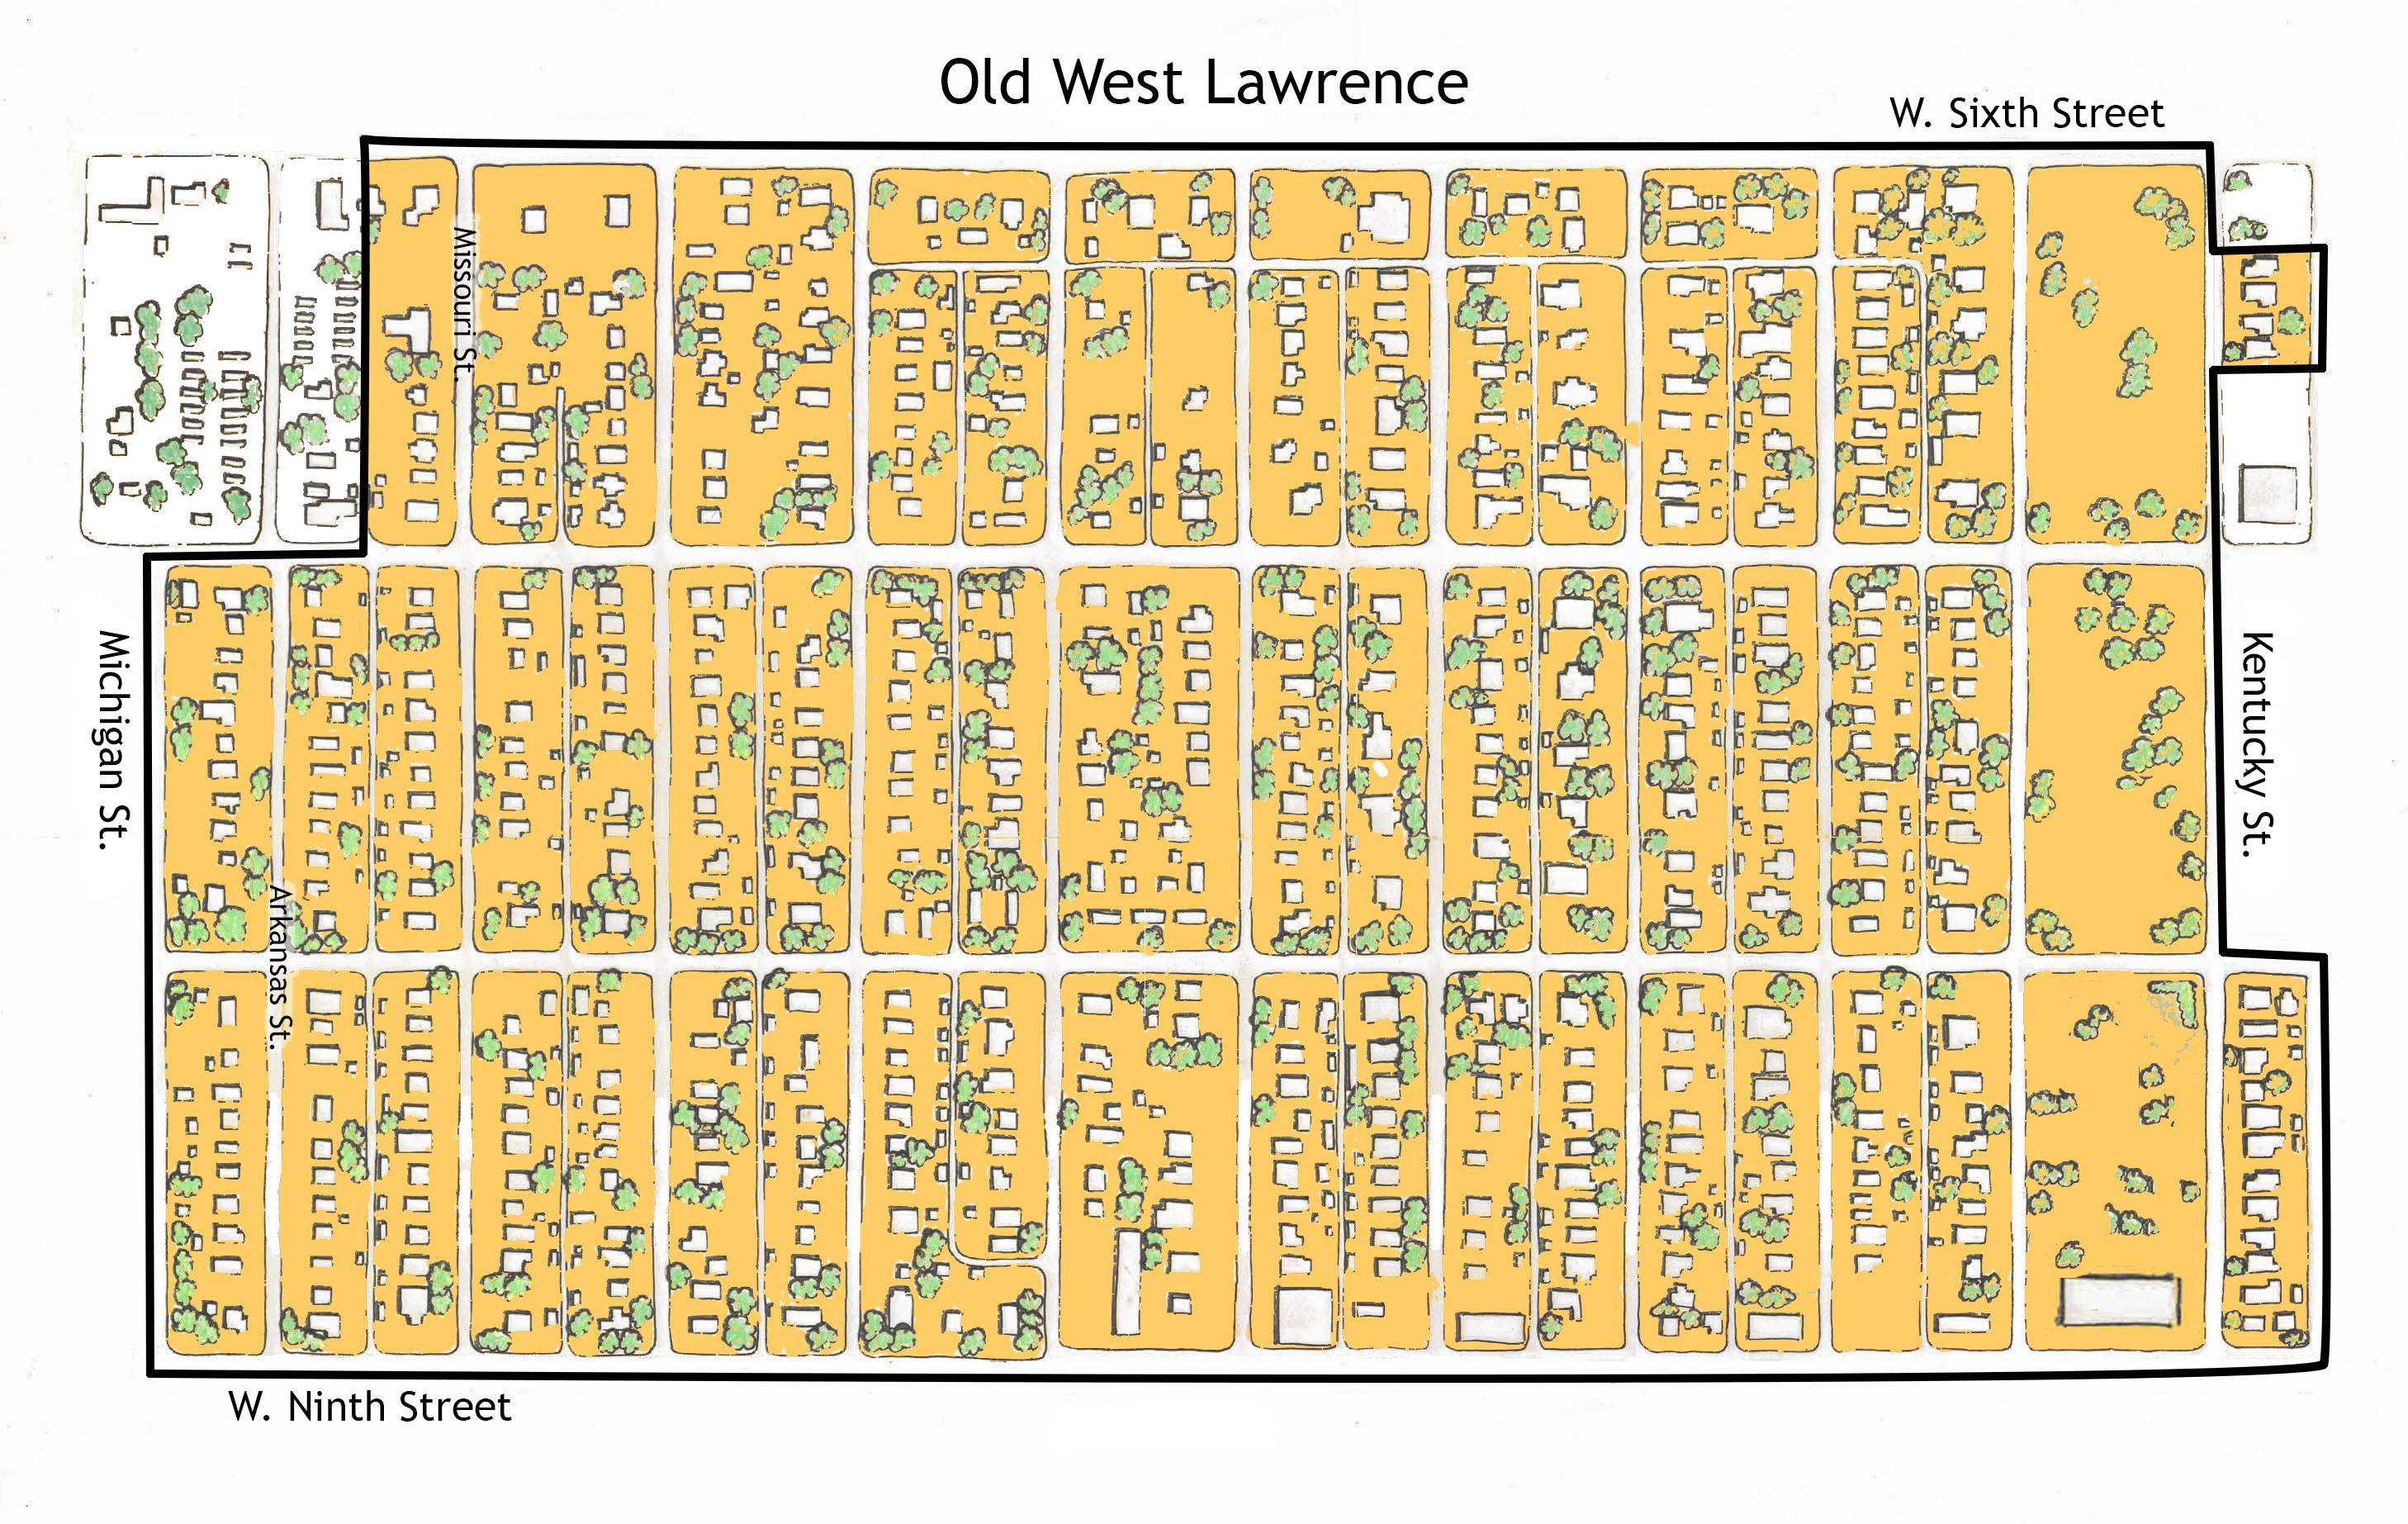 Maps Old West Lawrence Association